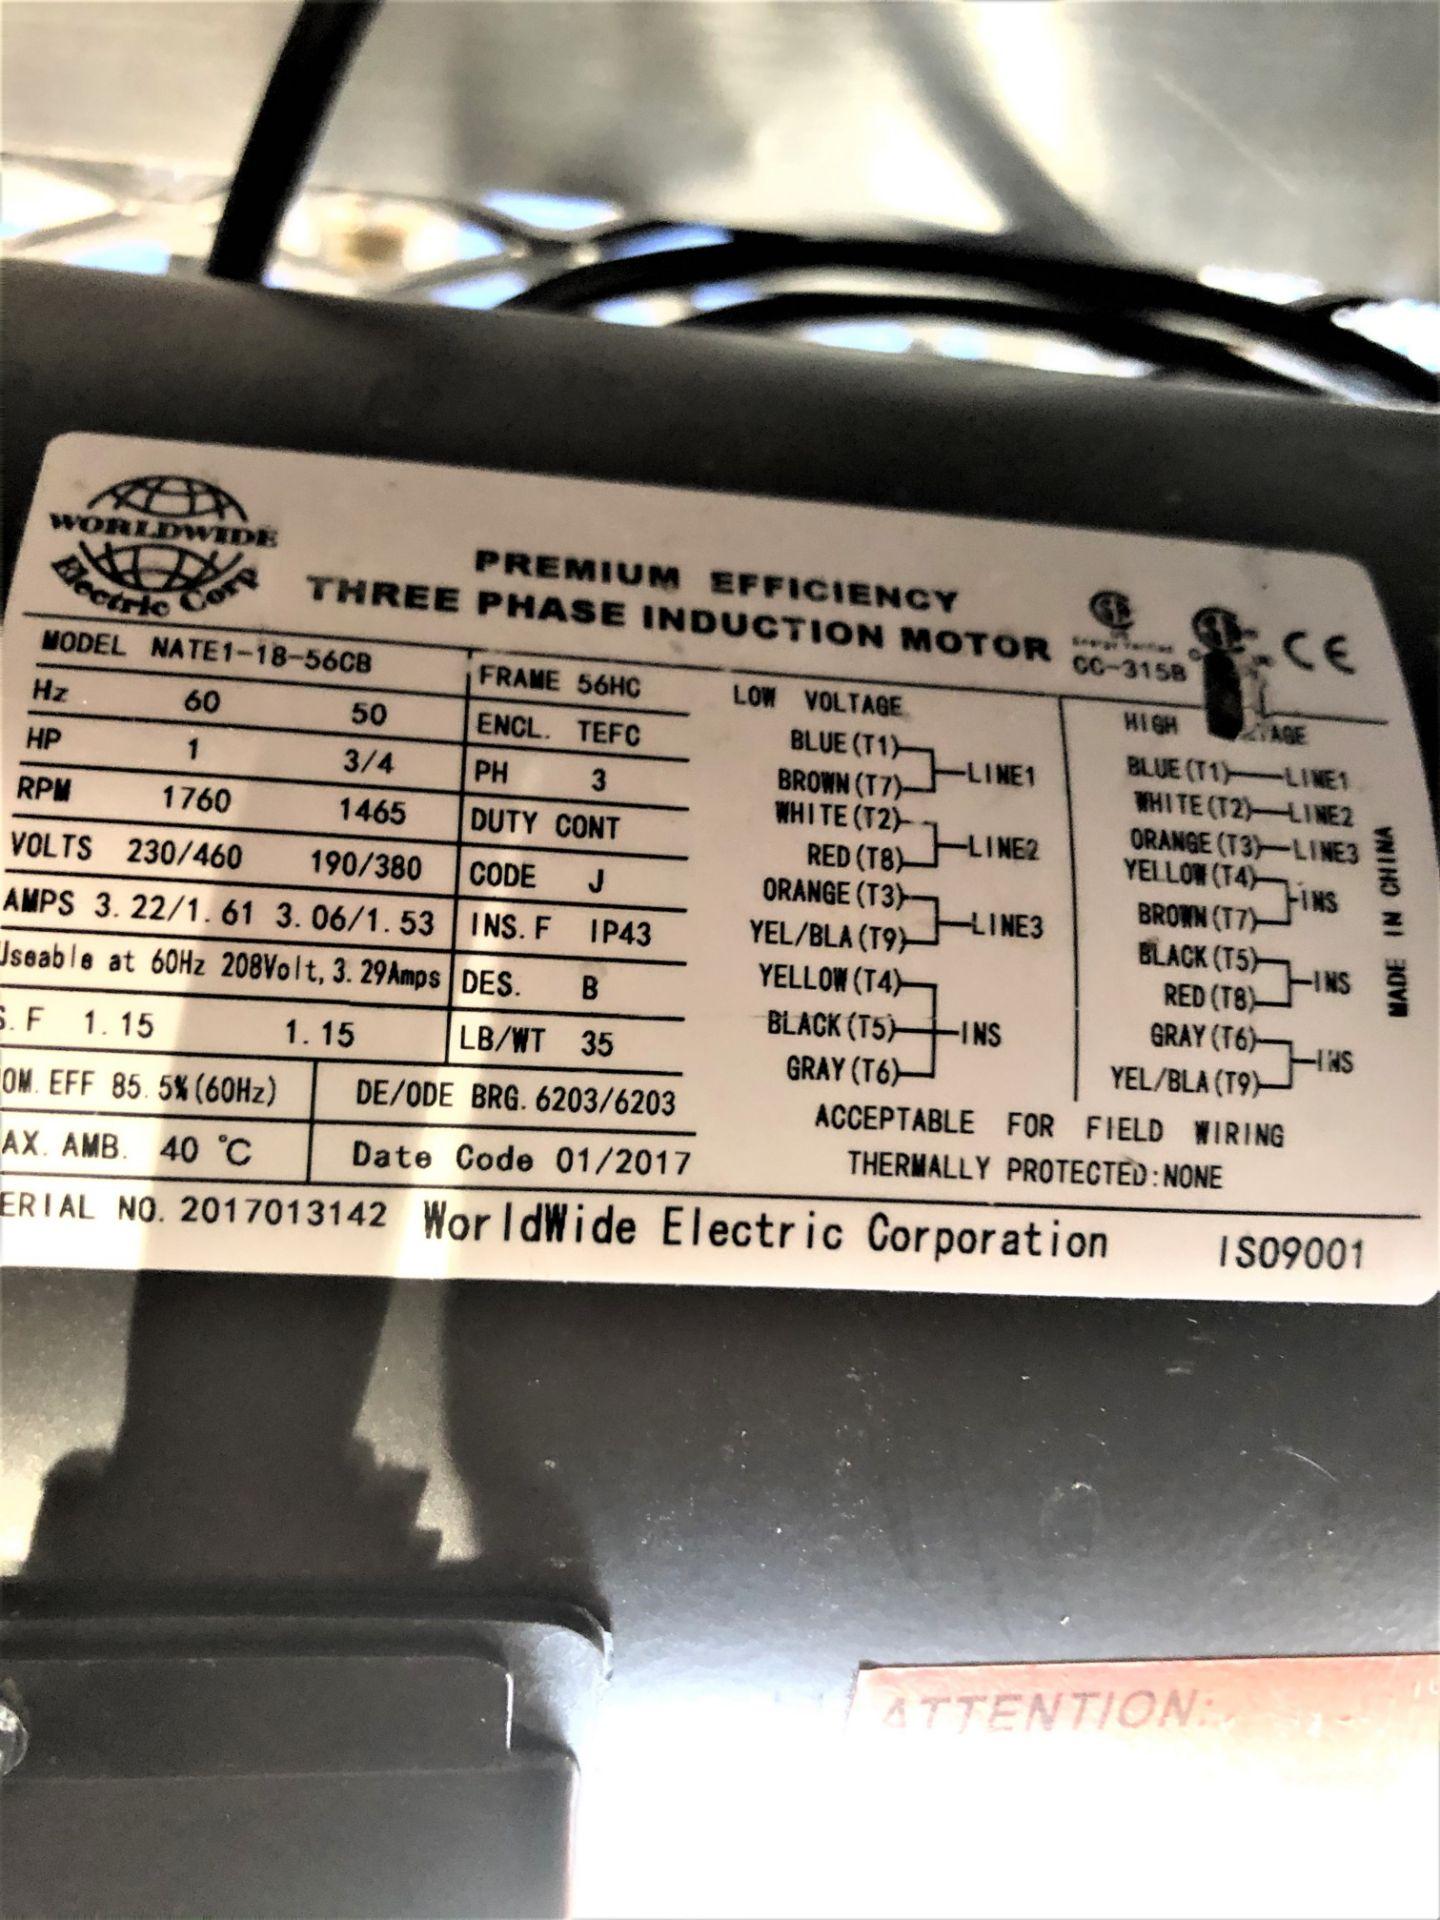 Used- Tumble Dryer w/ Molecular Sieve Column & 55 Gallon Collection Drum. Volume: 18 CuFt. - Image 10 of 11